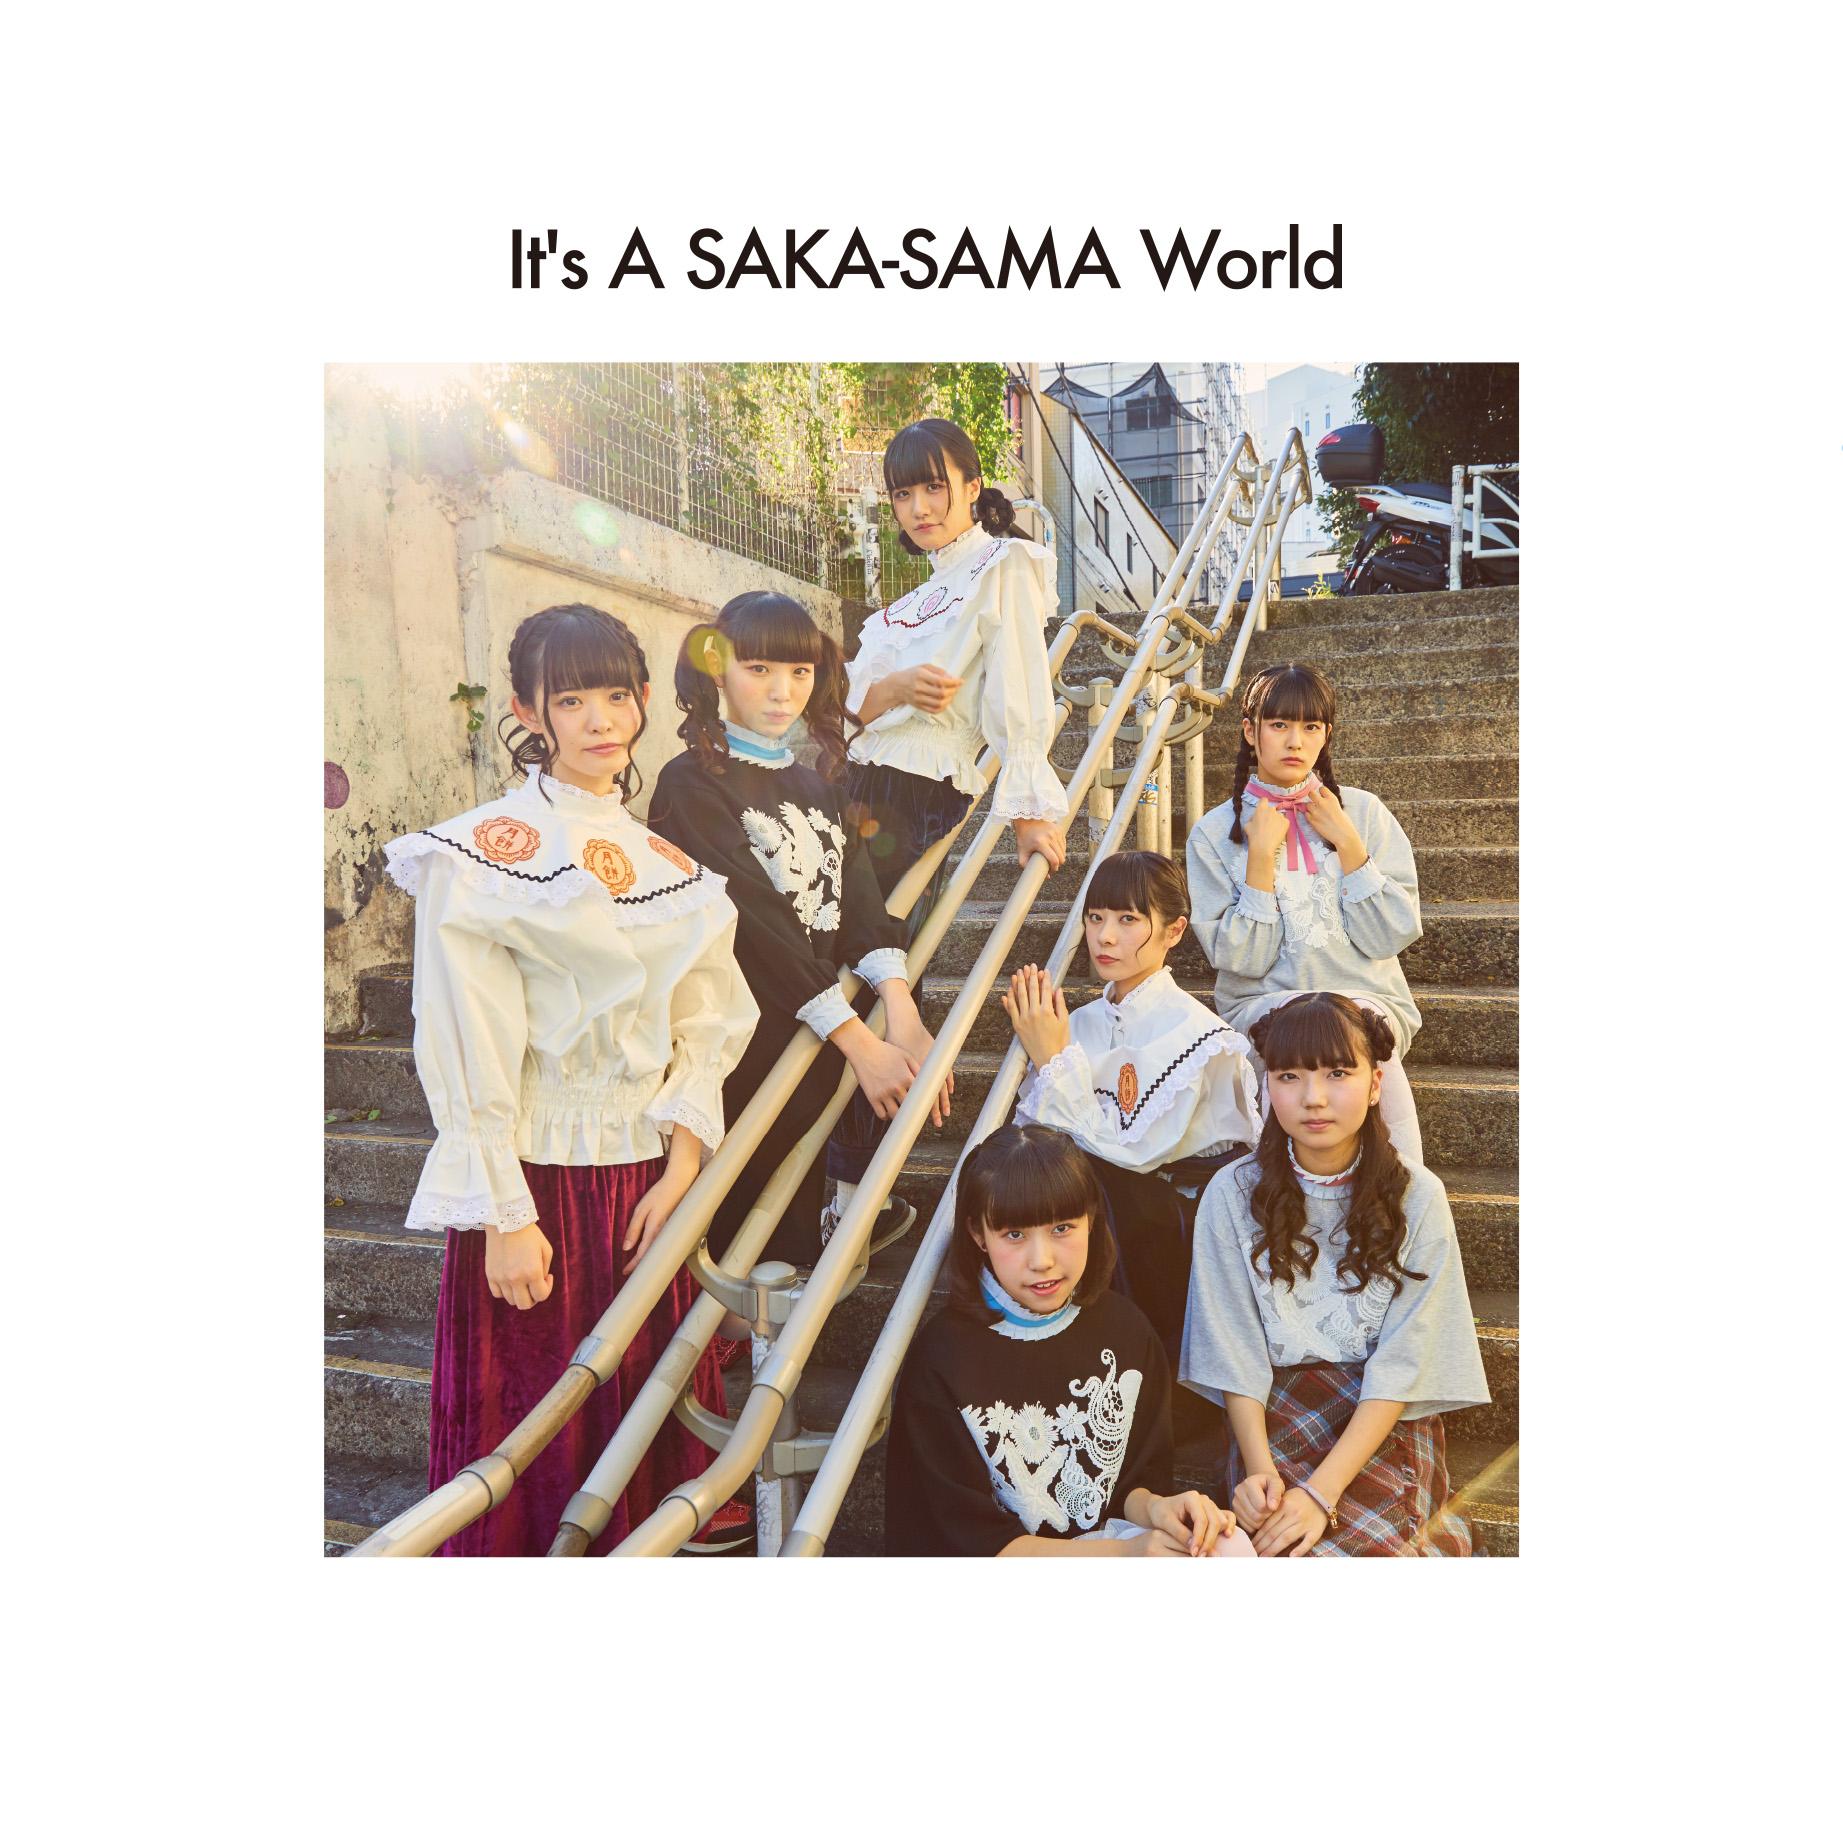 SAKA-SAMA、1stアルバム・レコ発<東京編>に曽我部恵一、どついたるねん、<大阪編>にみんなのこどもちゃん&電影と少年CQが登場